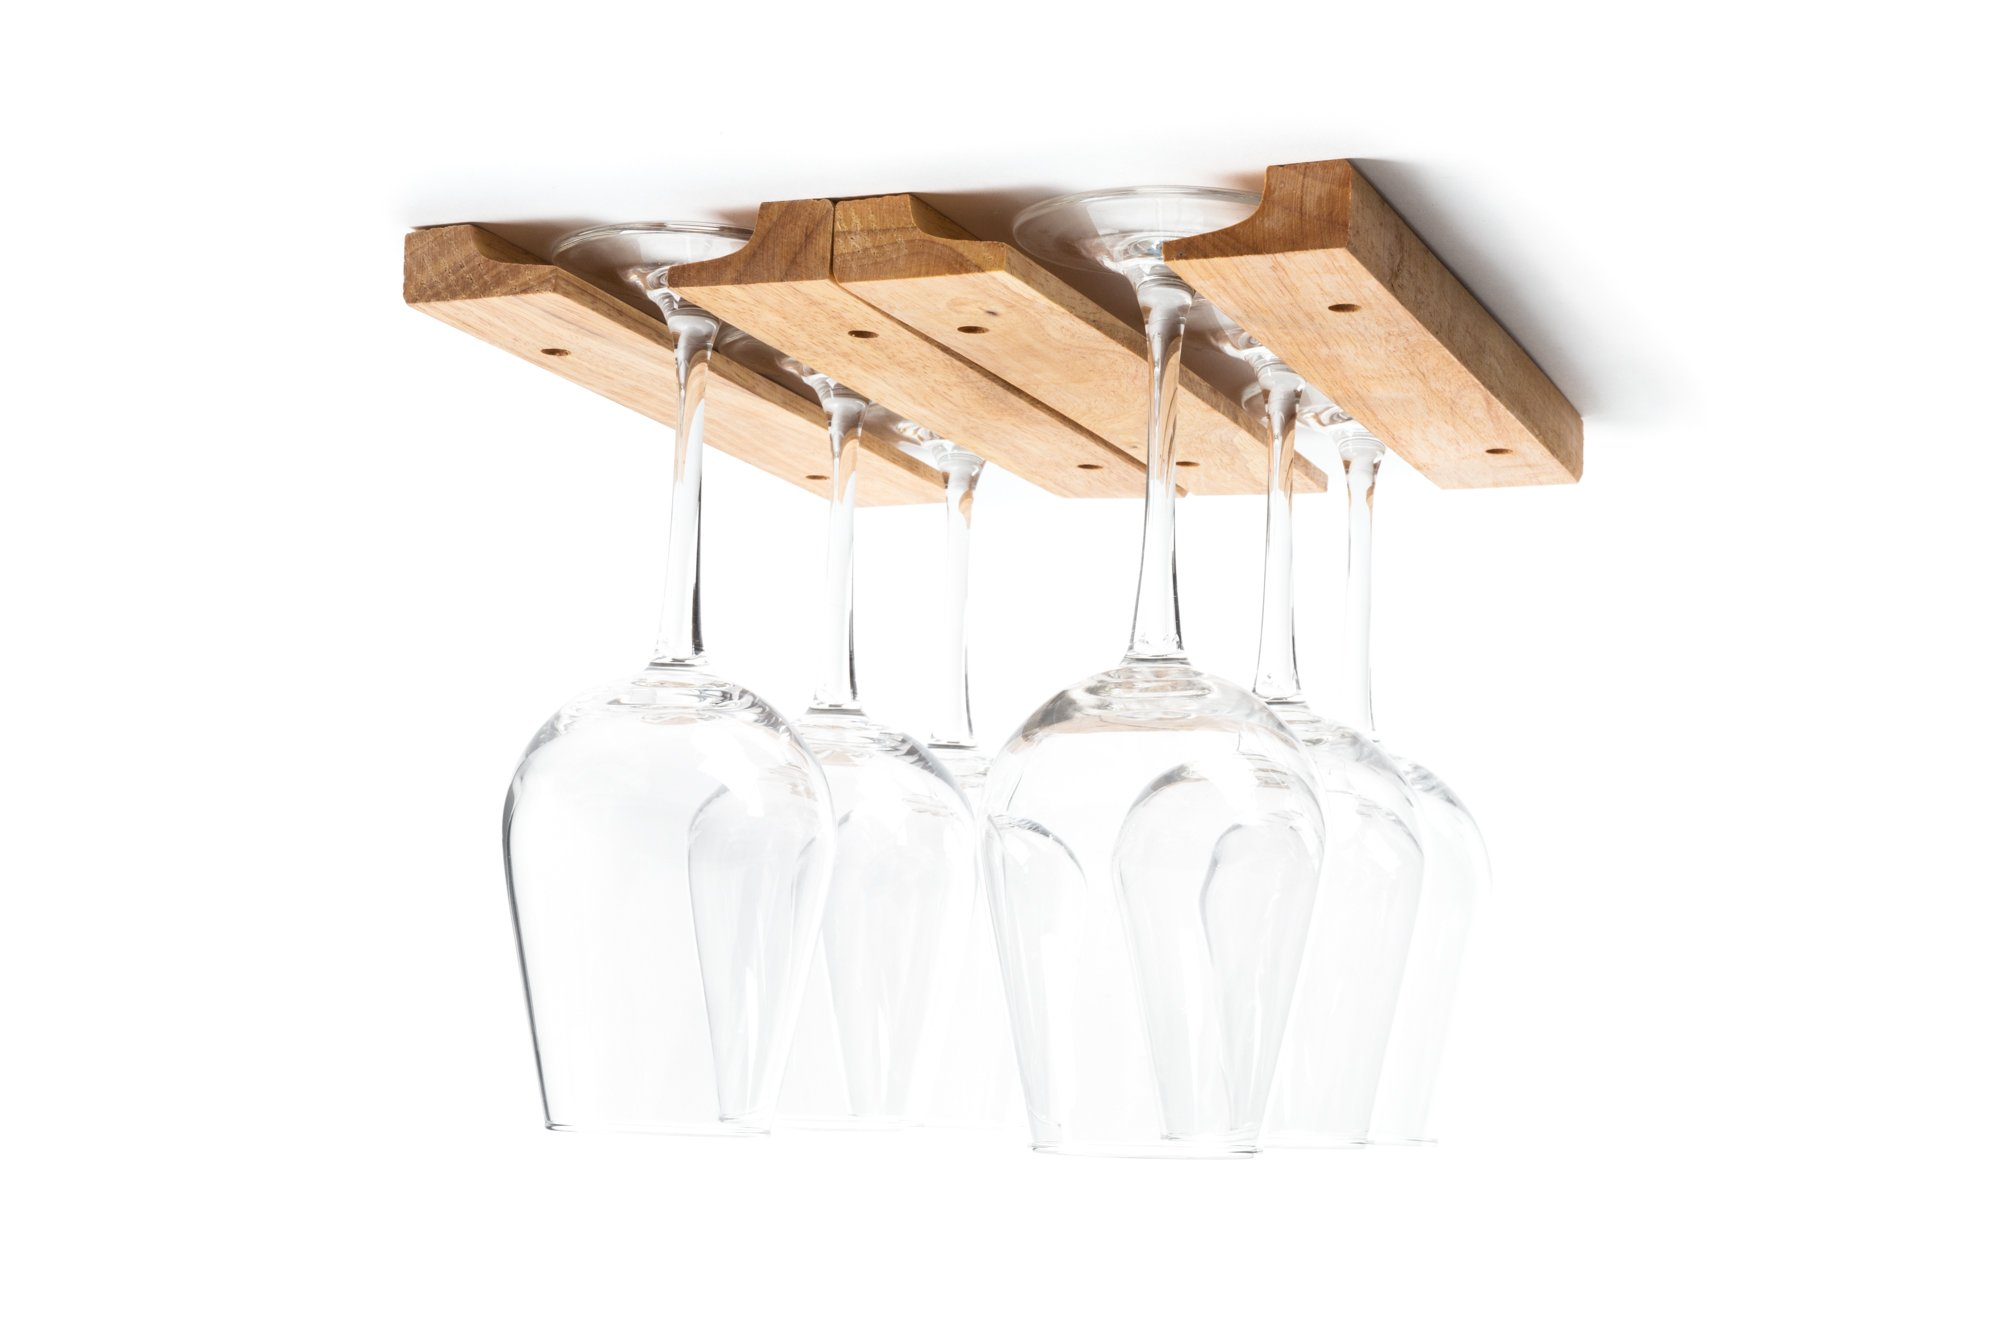 Fox Run 5025 Wine Glass Holder Rack, Wood